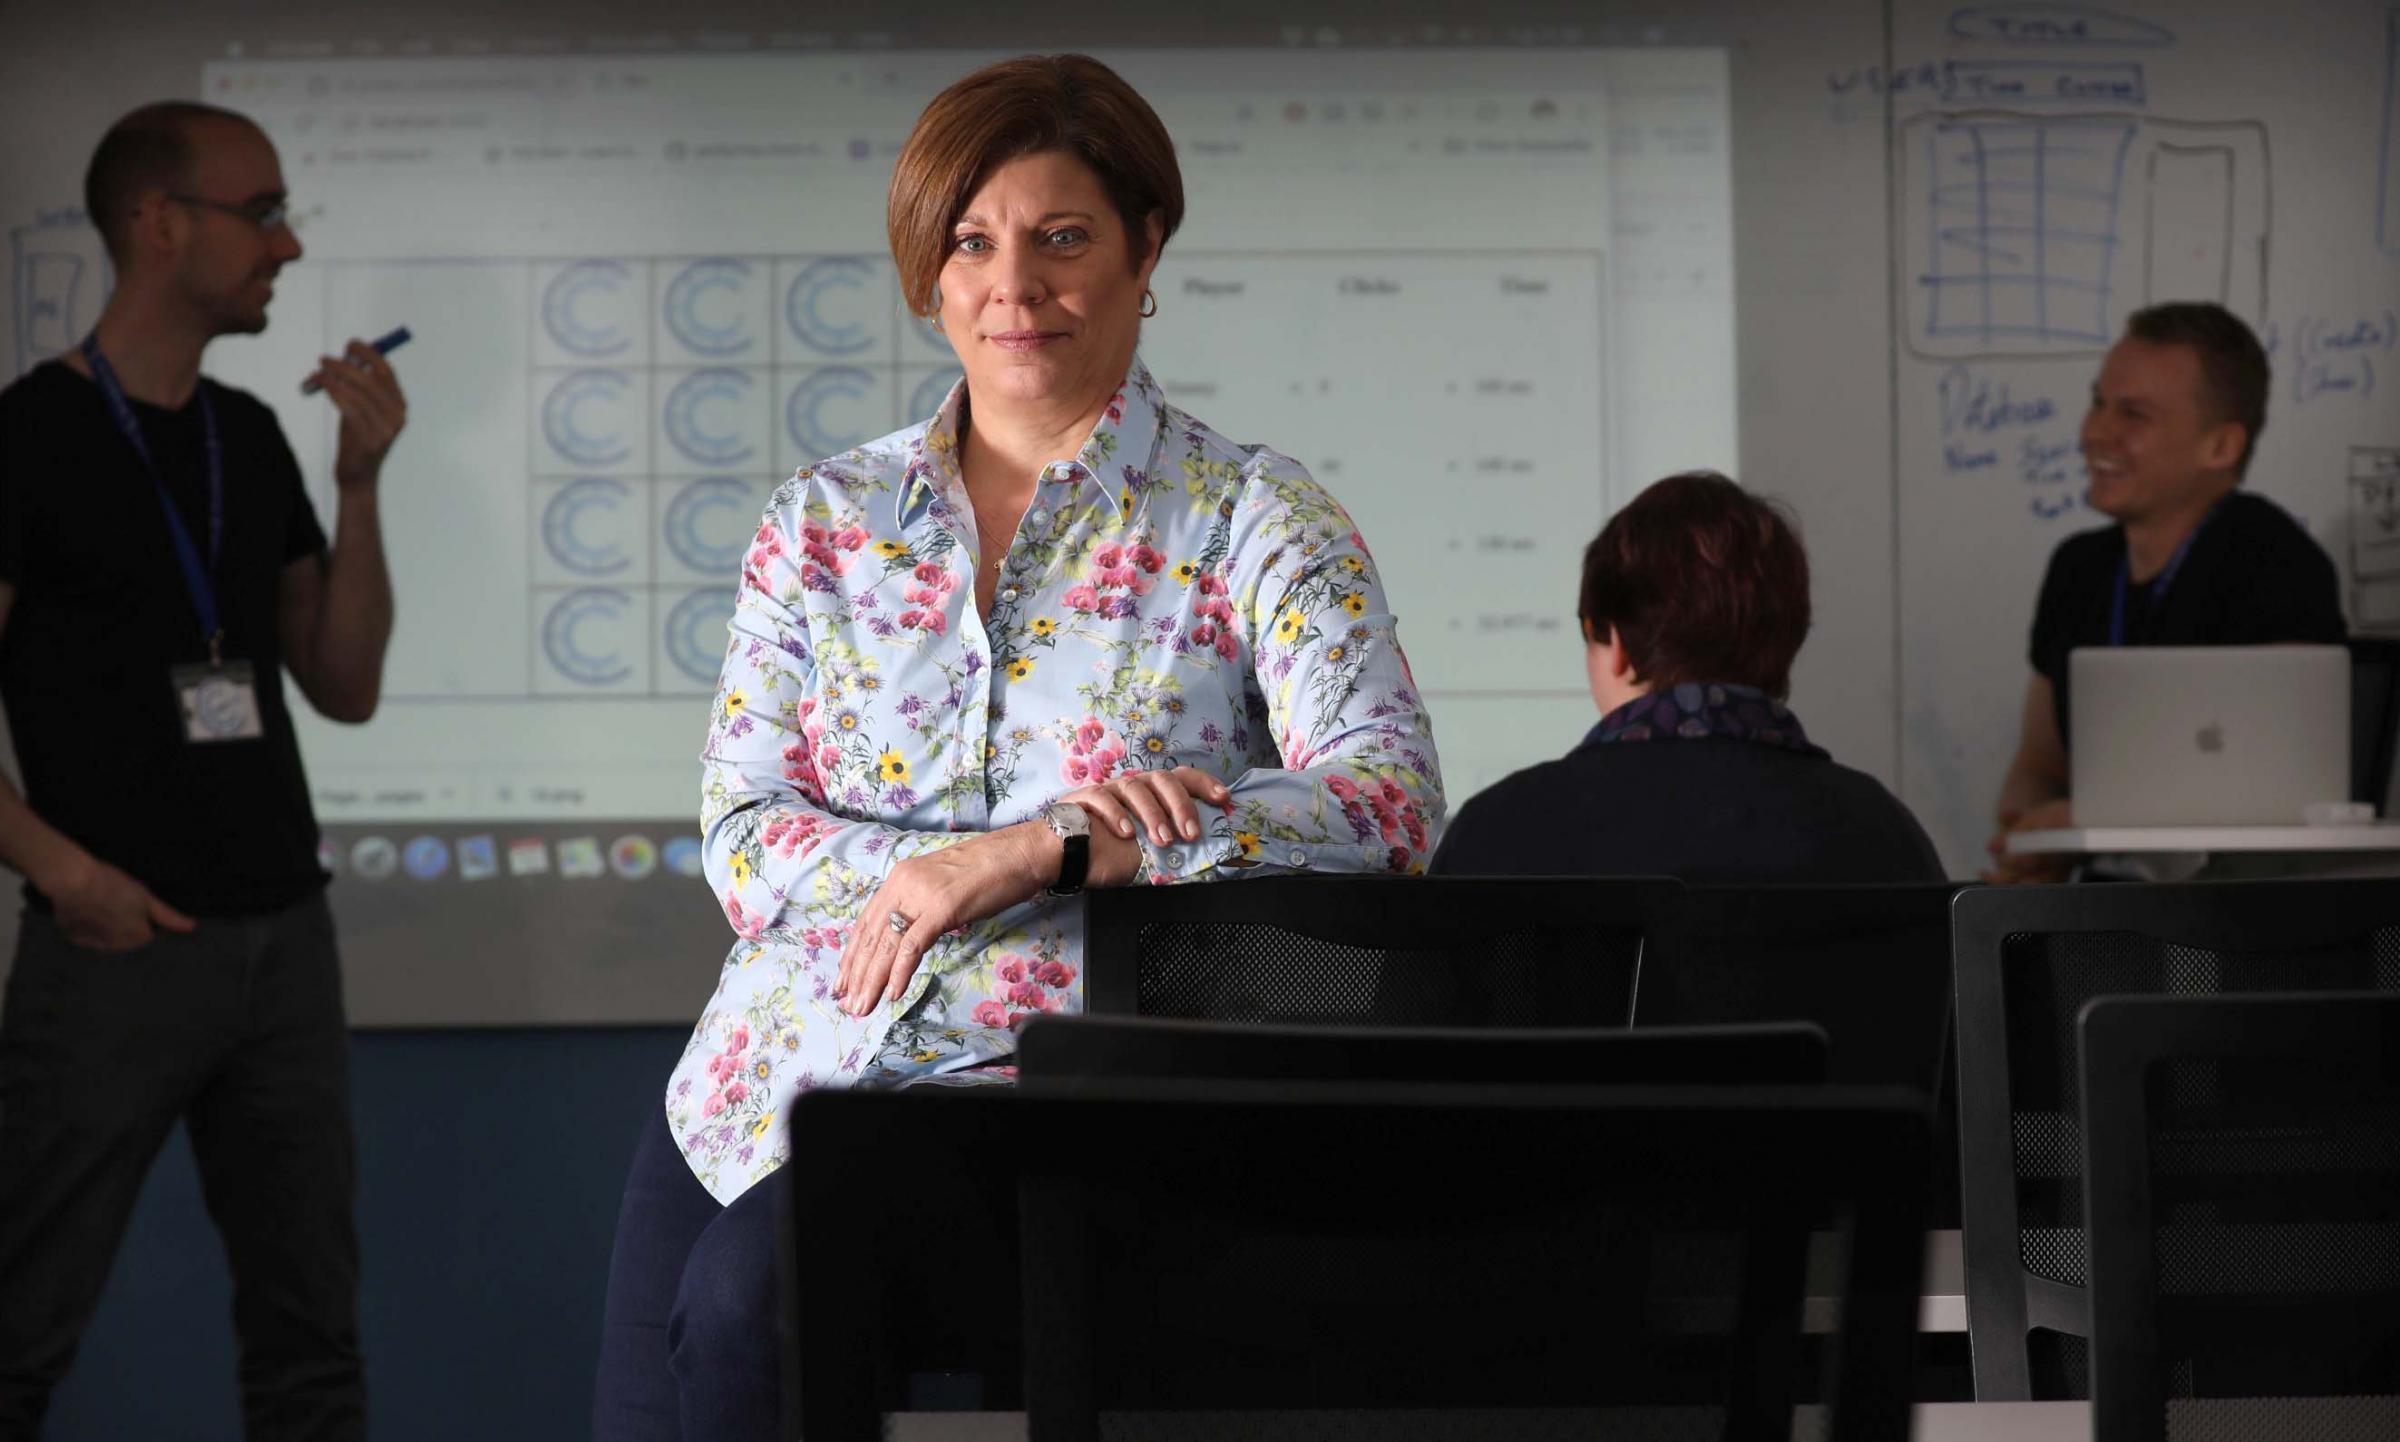 Scottish digital skills expert CodeClan launches Data analysis course